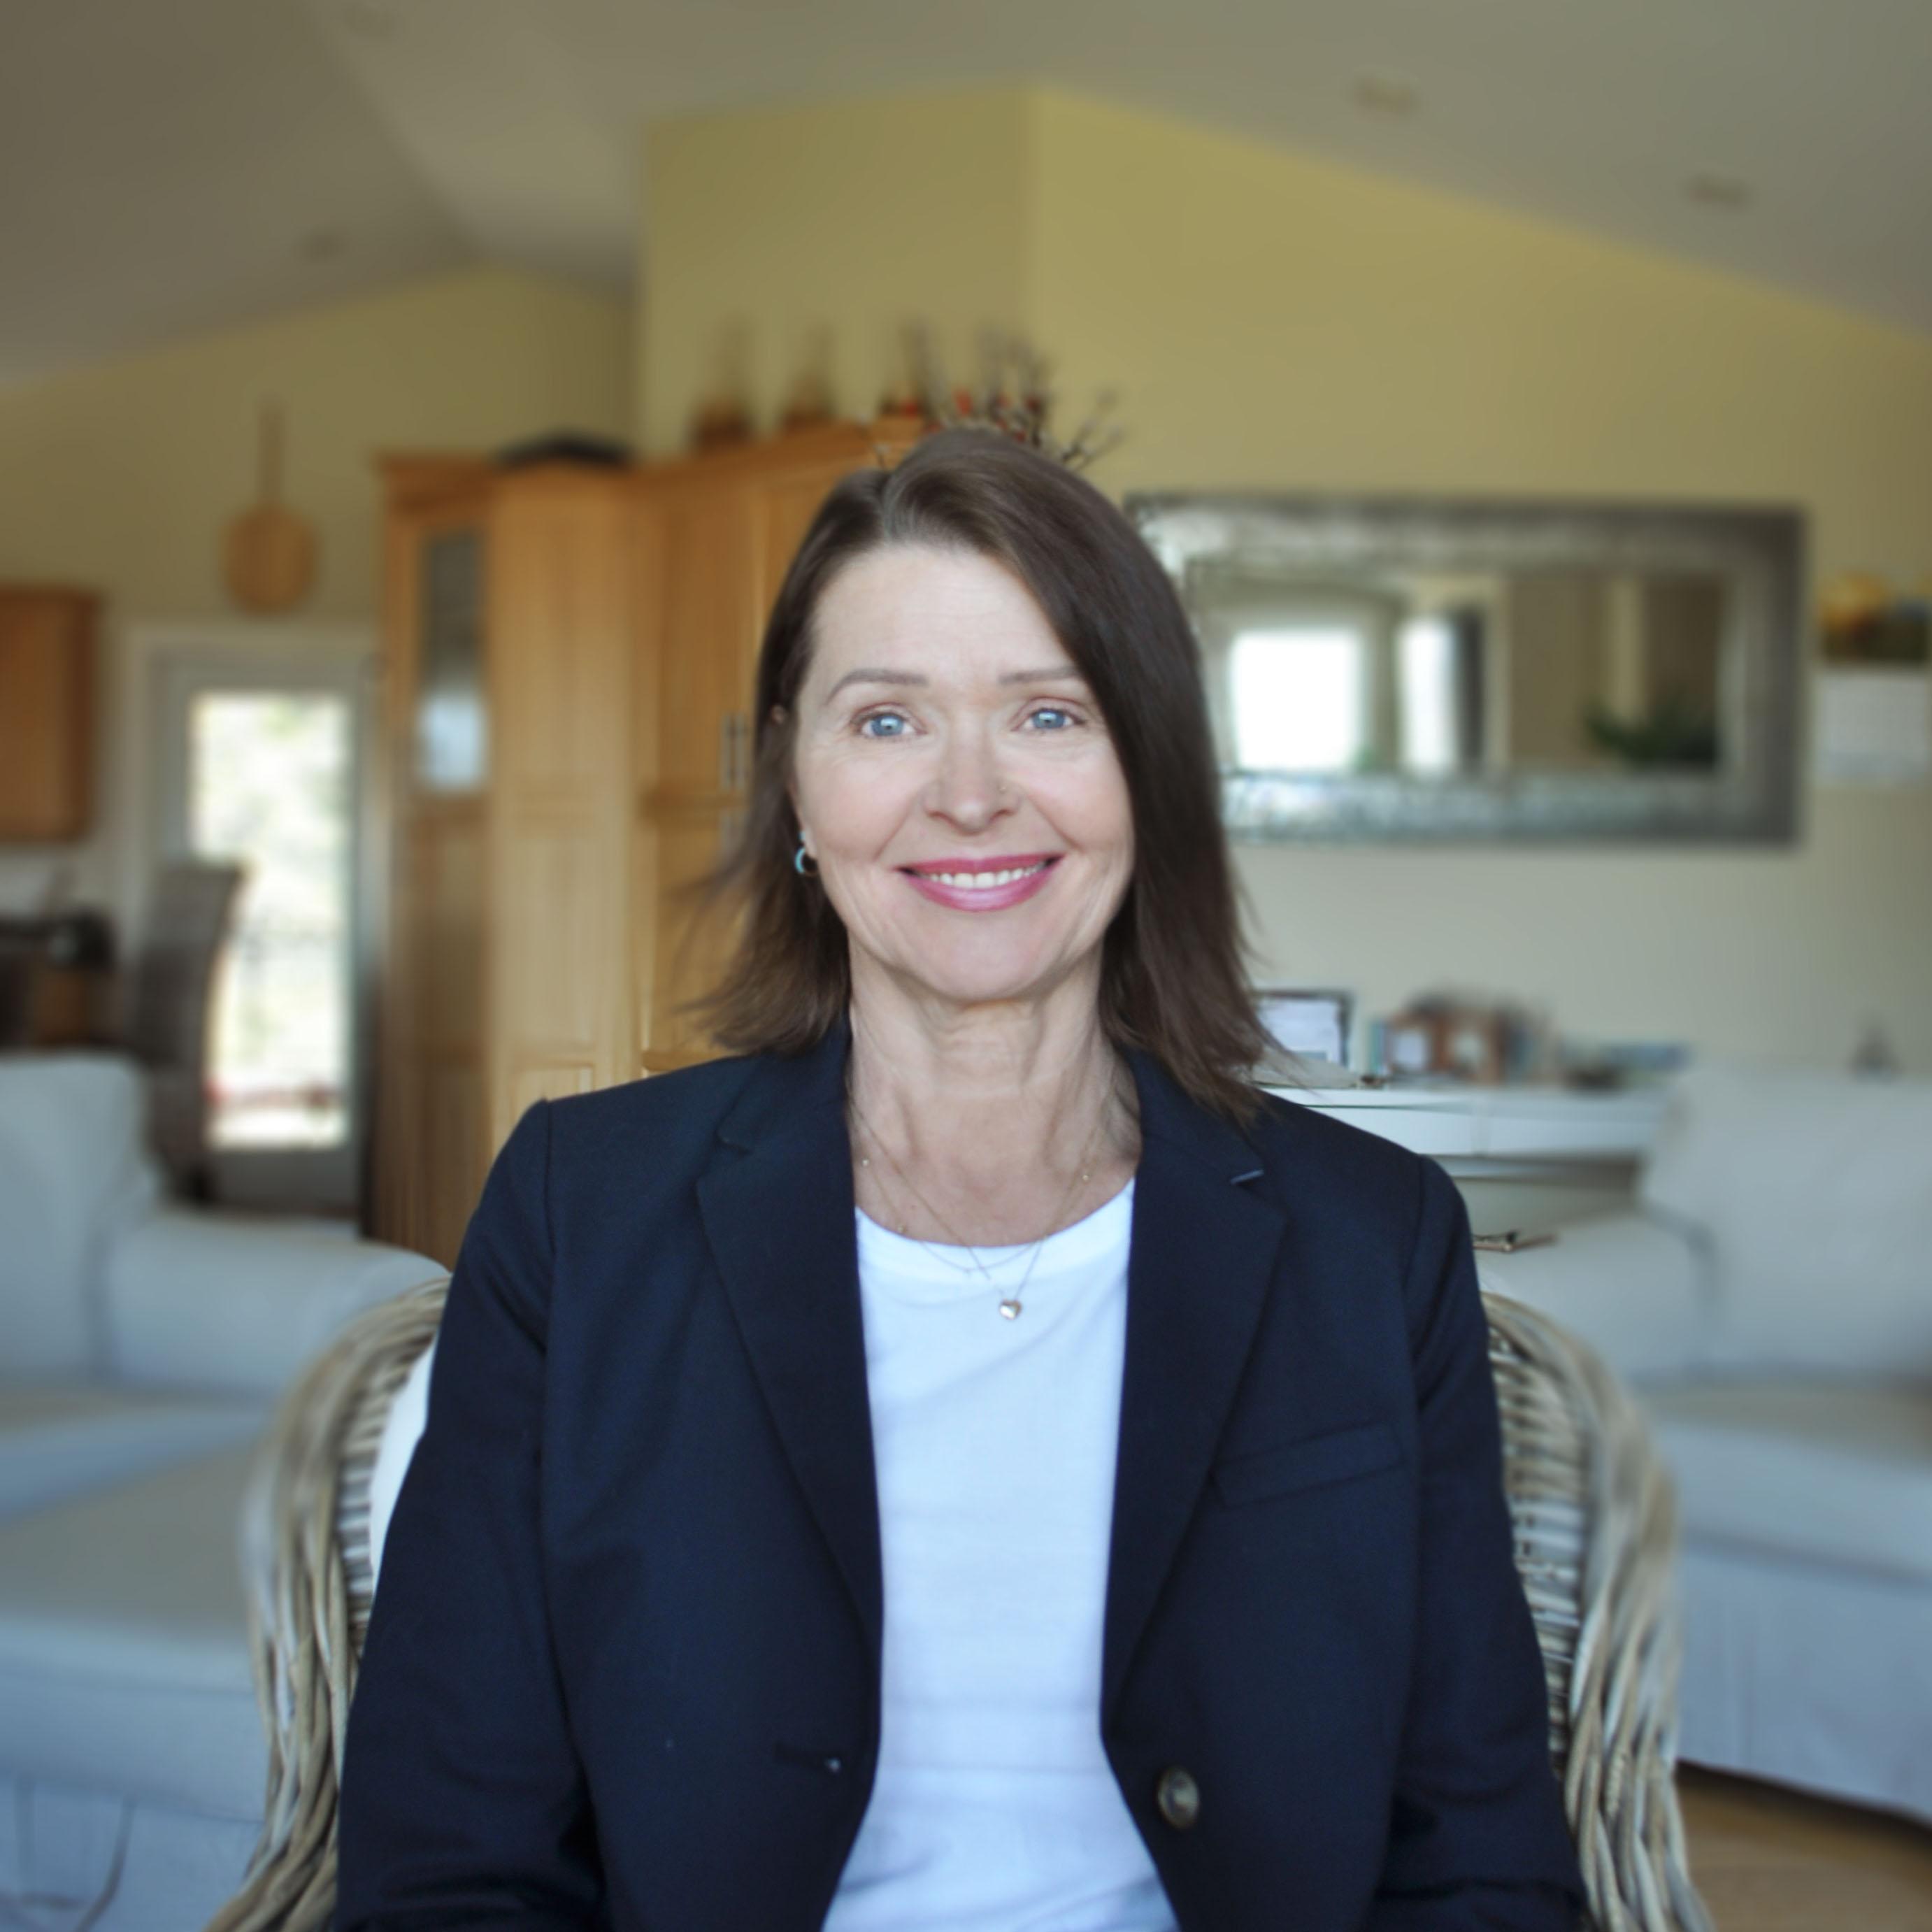 Portrait of Counsellor Sheila Clements